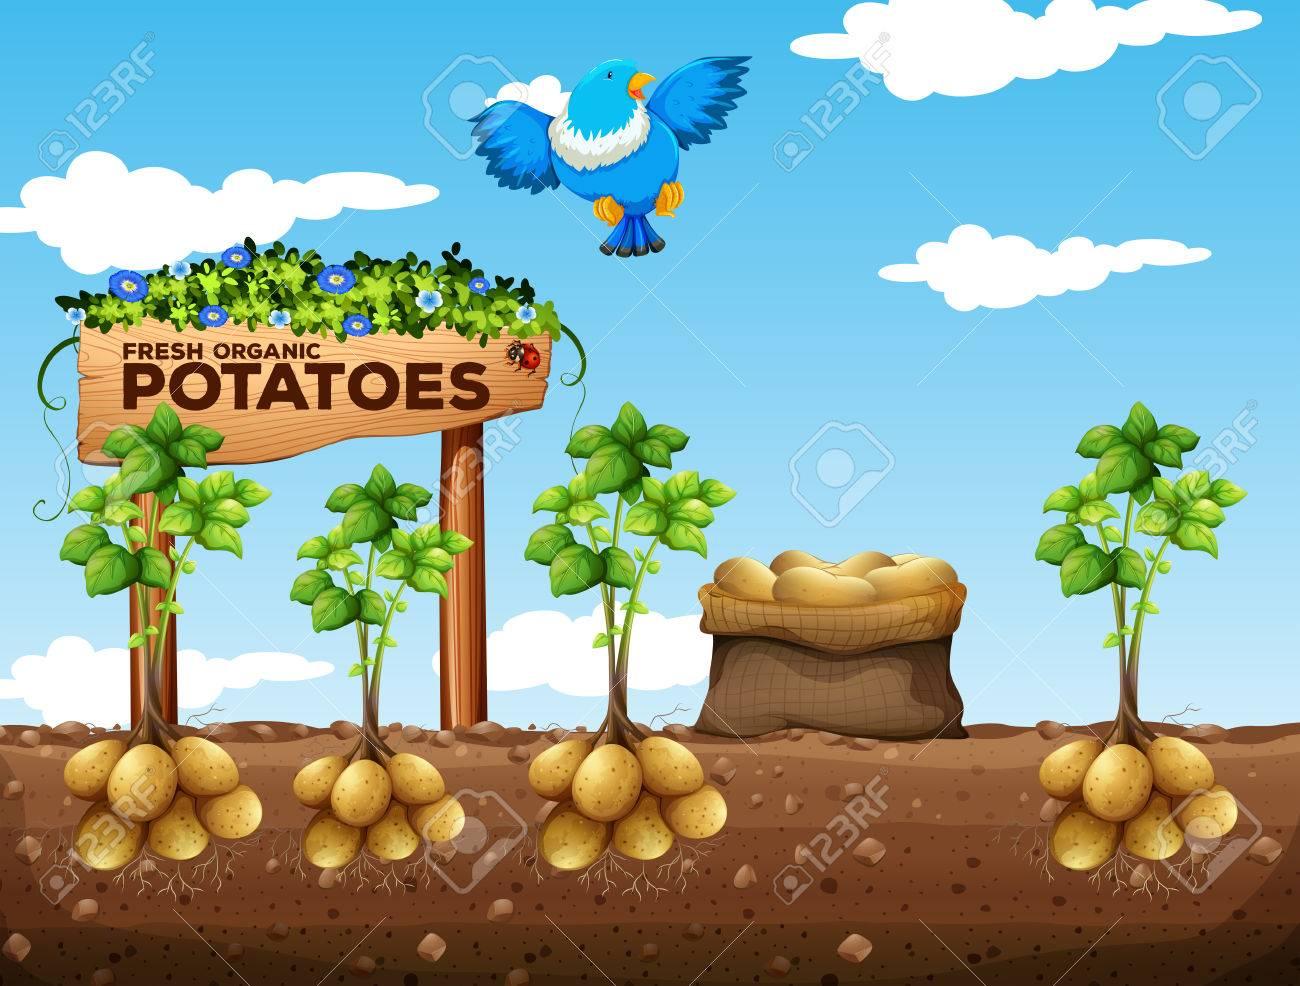 Scene of potatoes farm illustration - 55638372